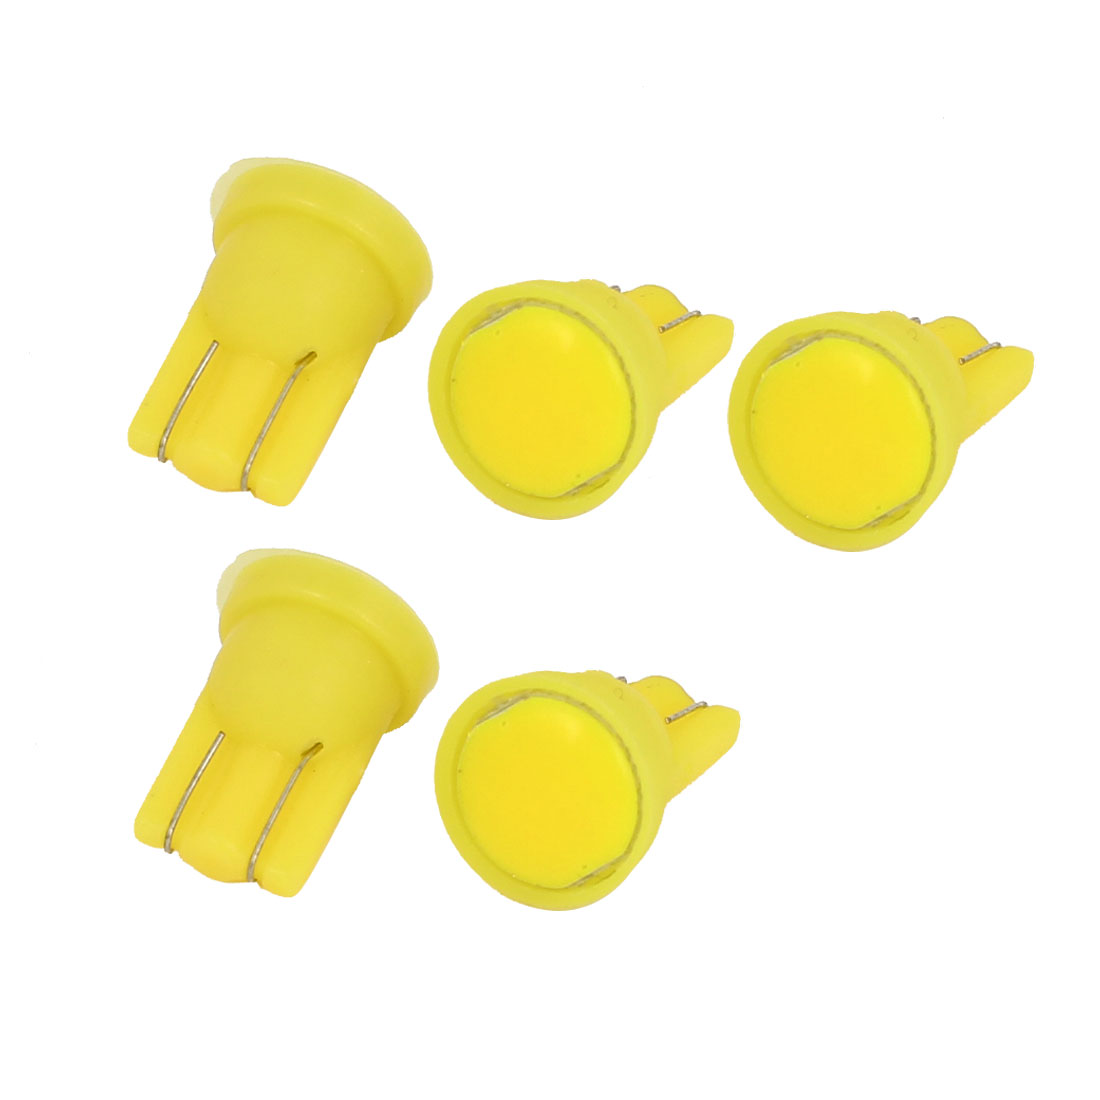 5 Pcs Car Wedge Yellow 6 Clip COB LED T10 Side Tail Turning Bulb Lamp